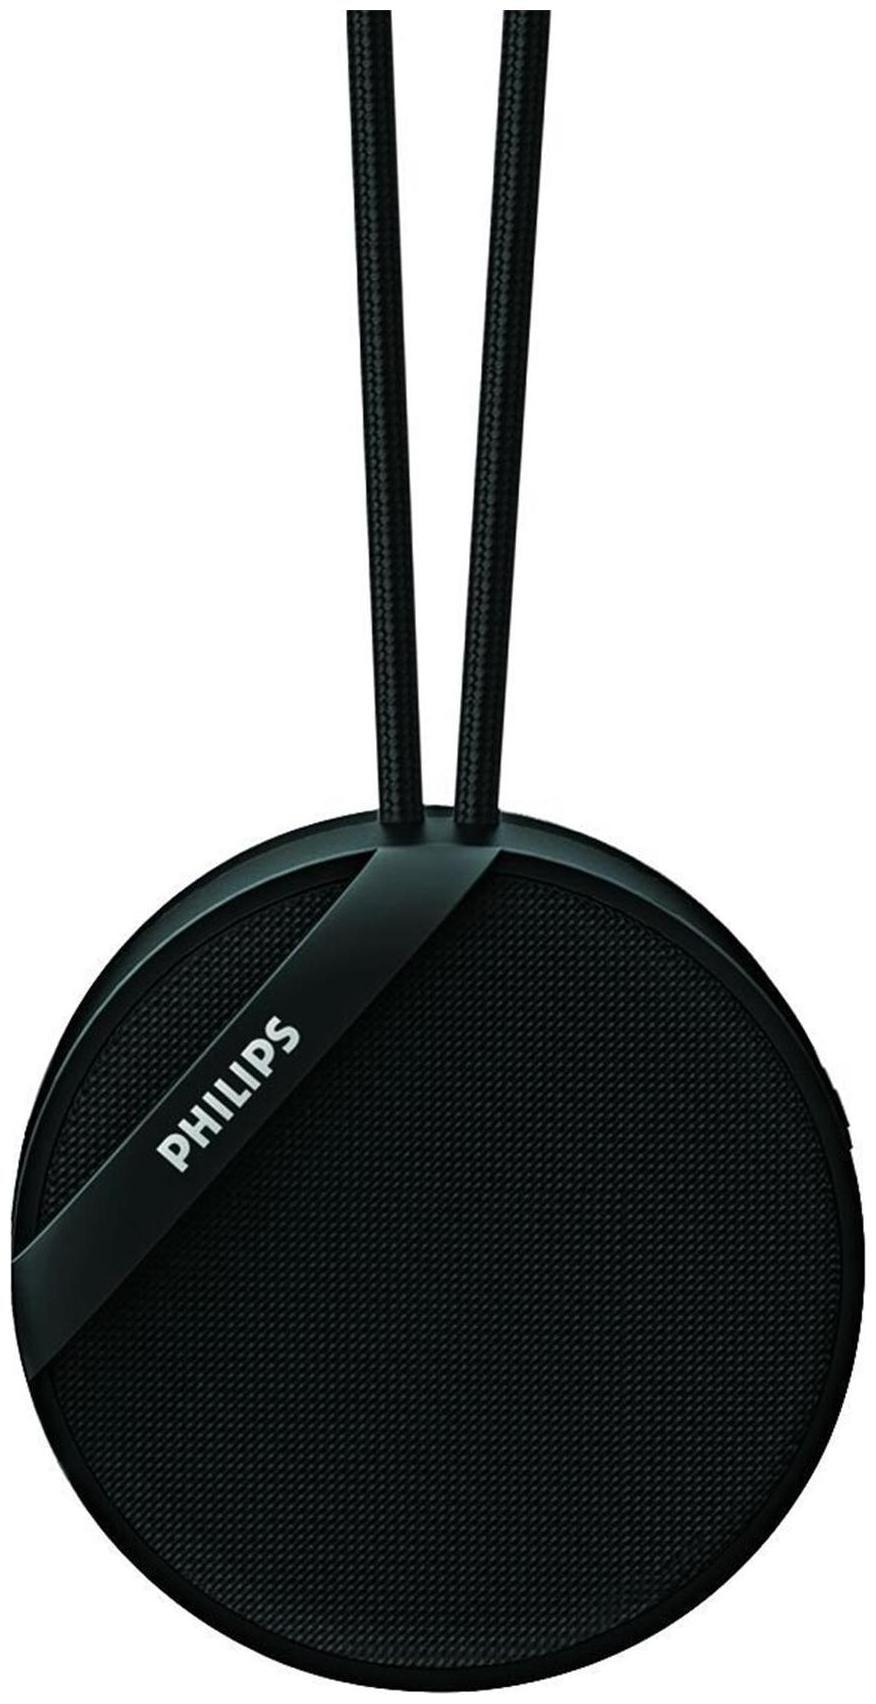 Philips IN BT40BK/94 Bluetooth Portable Speaker   Black   by Gadget Freak